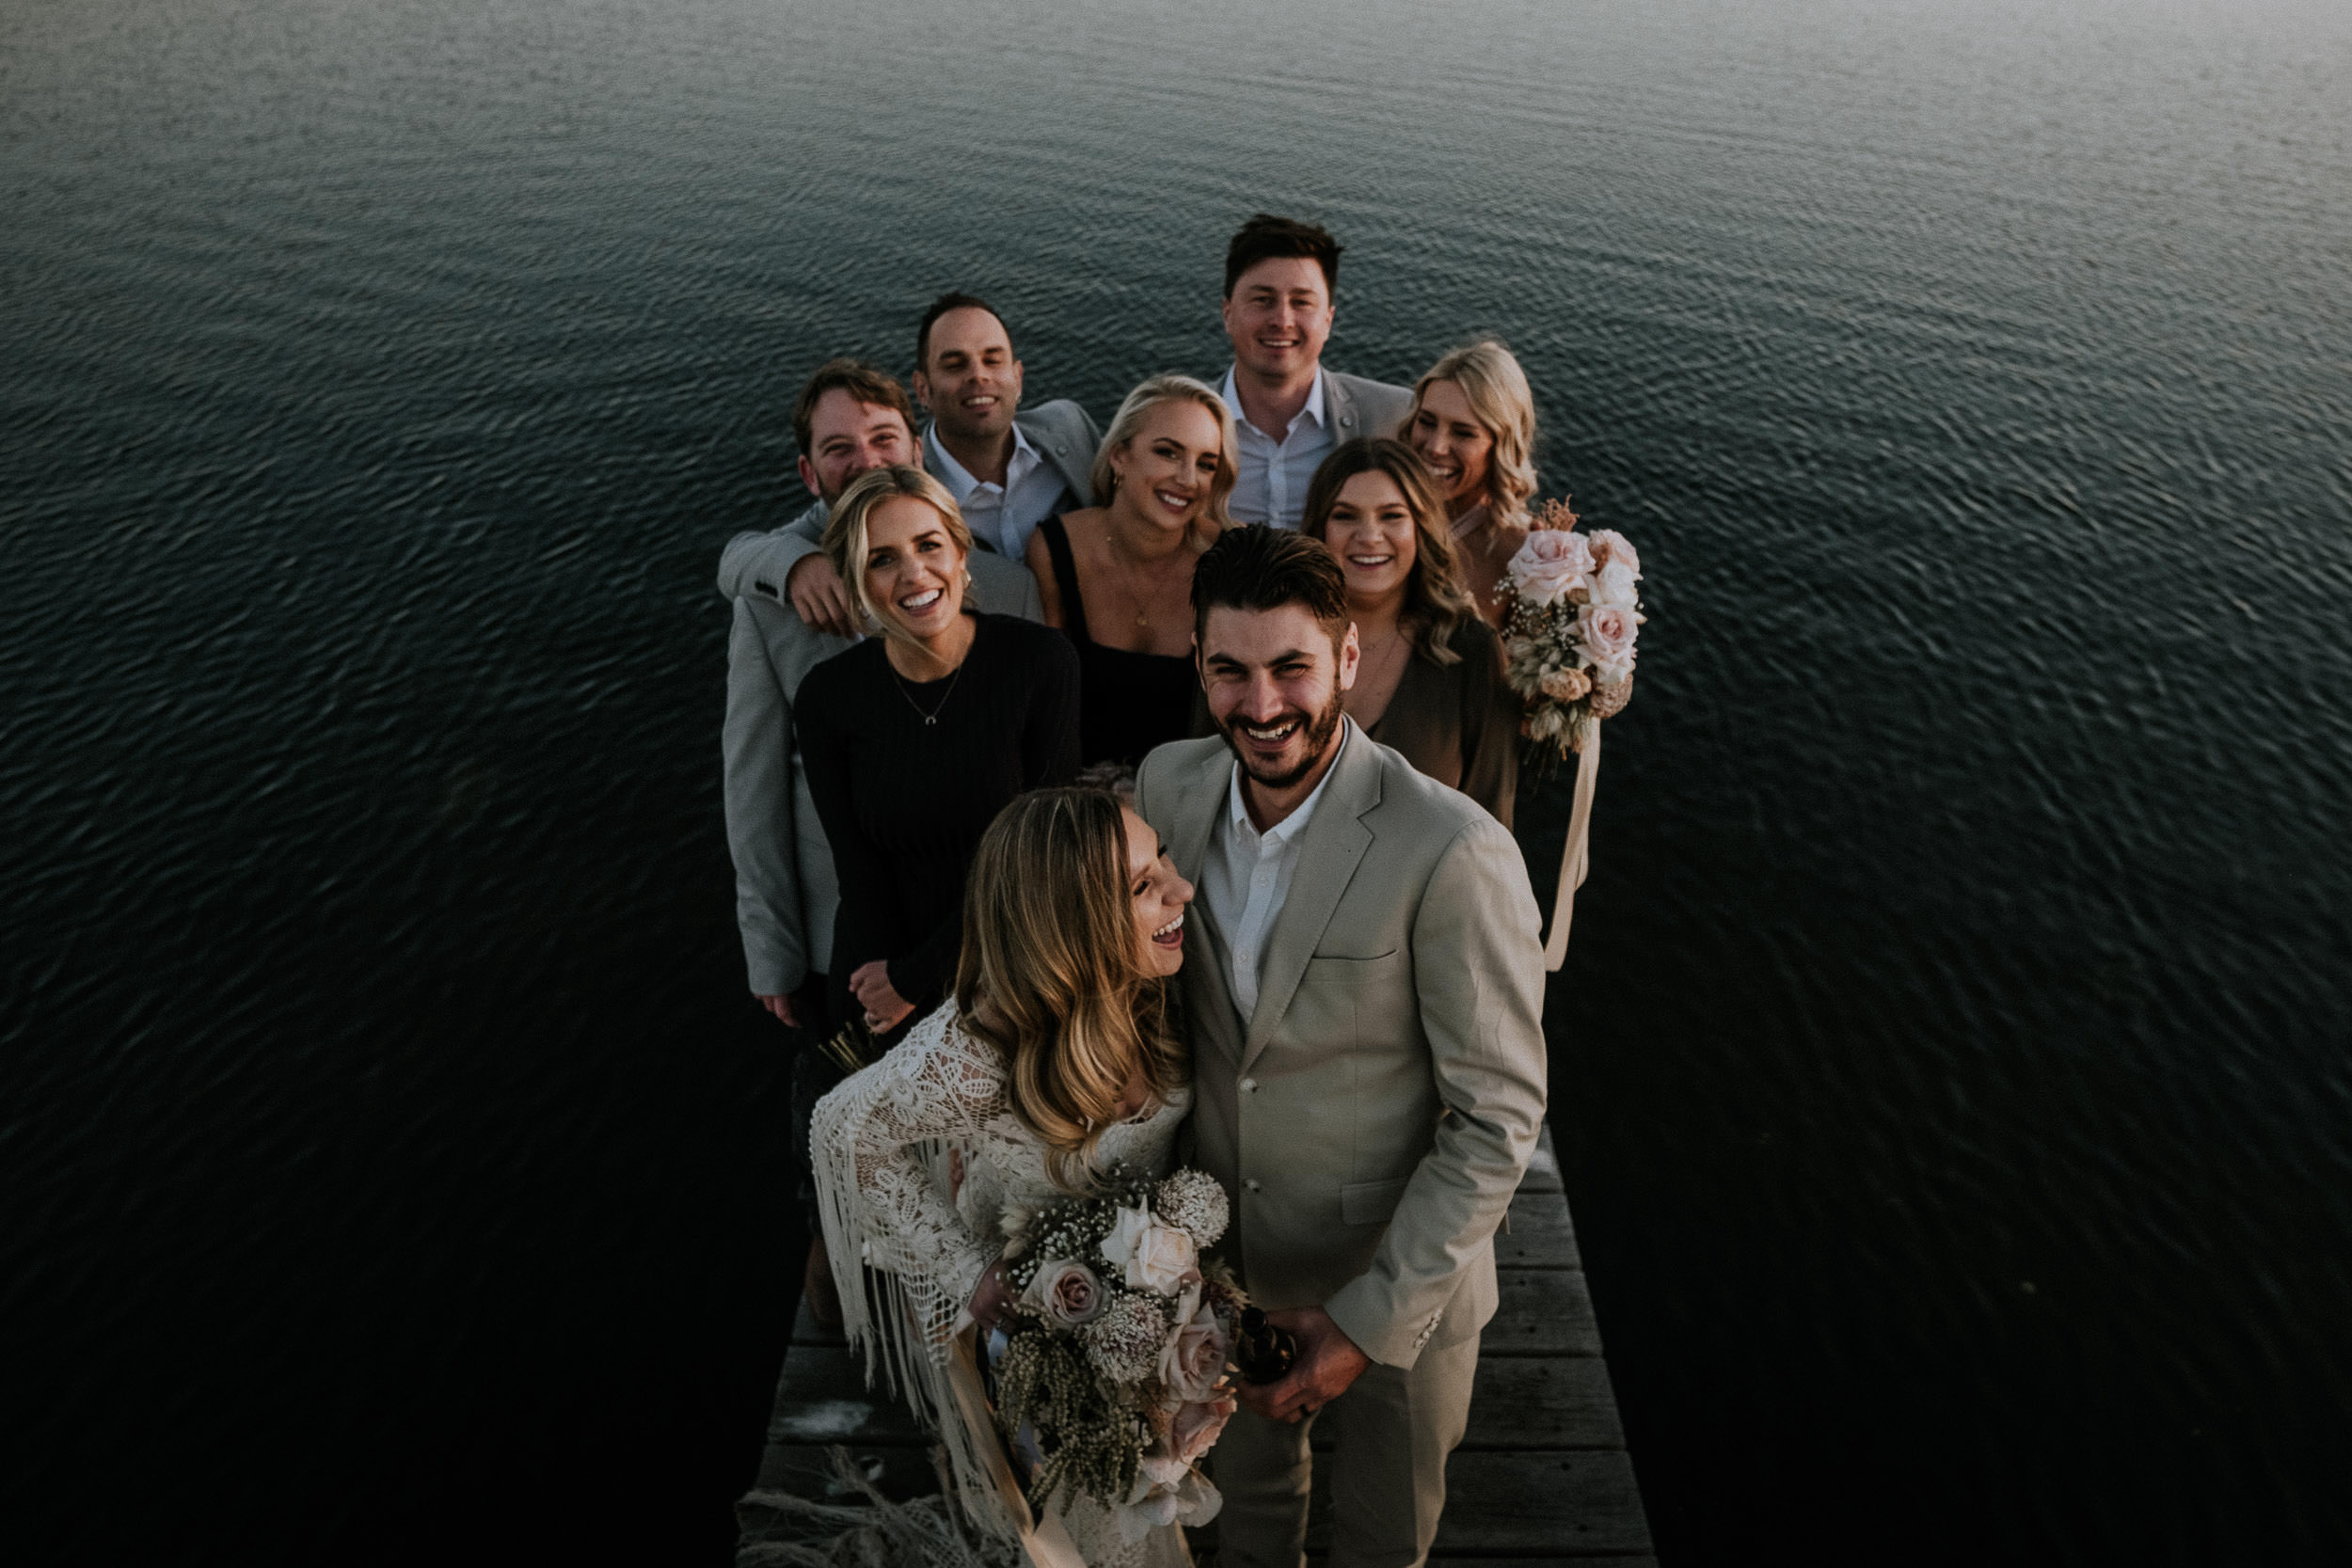 S&A Elopement - Kings & Thieves - Shred 'Til Dead - Central Coast Beach Forest Wedding - 380.jpg